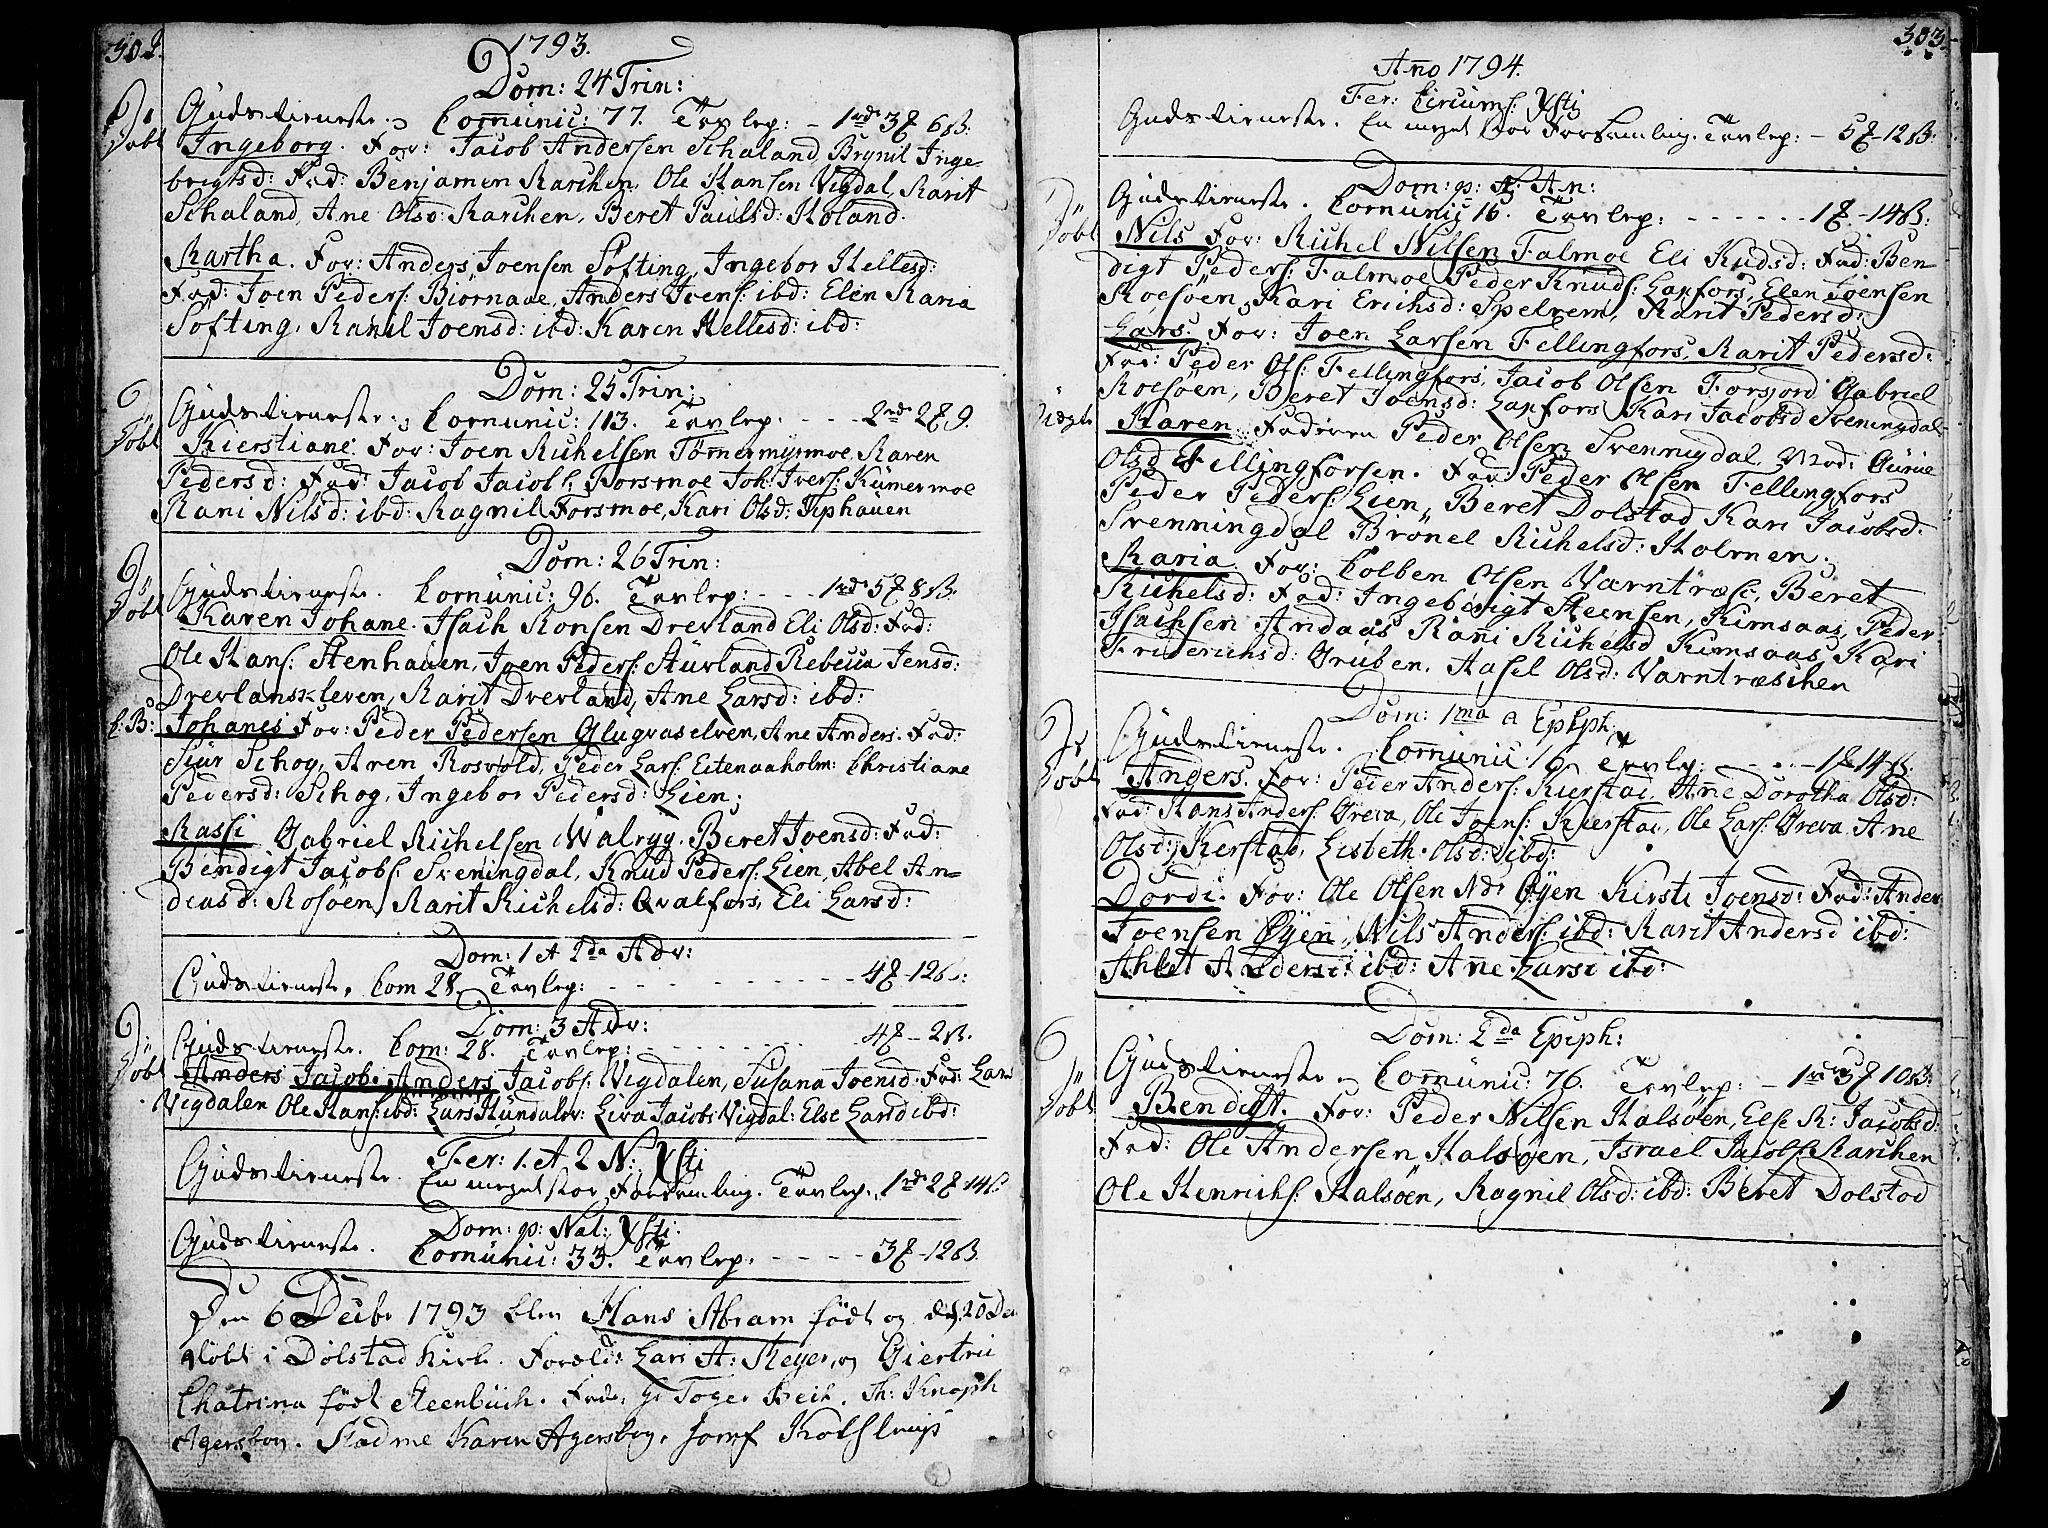 SAT, Ministerialprotokoller, klokkerbøker og fødselsregistre - Nordland, 820/L0286: Ministerialbok nr. 820A07, 1780-1799, s. 302-303